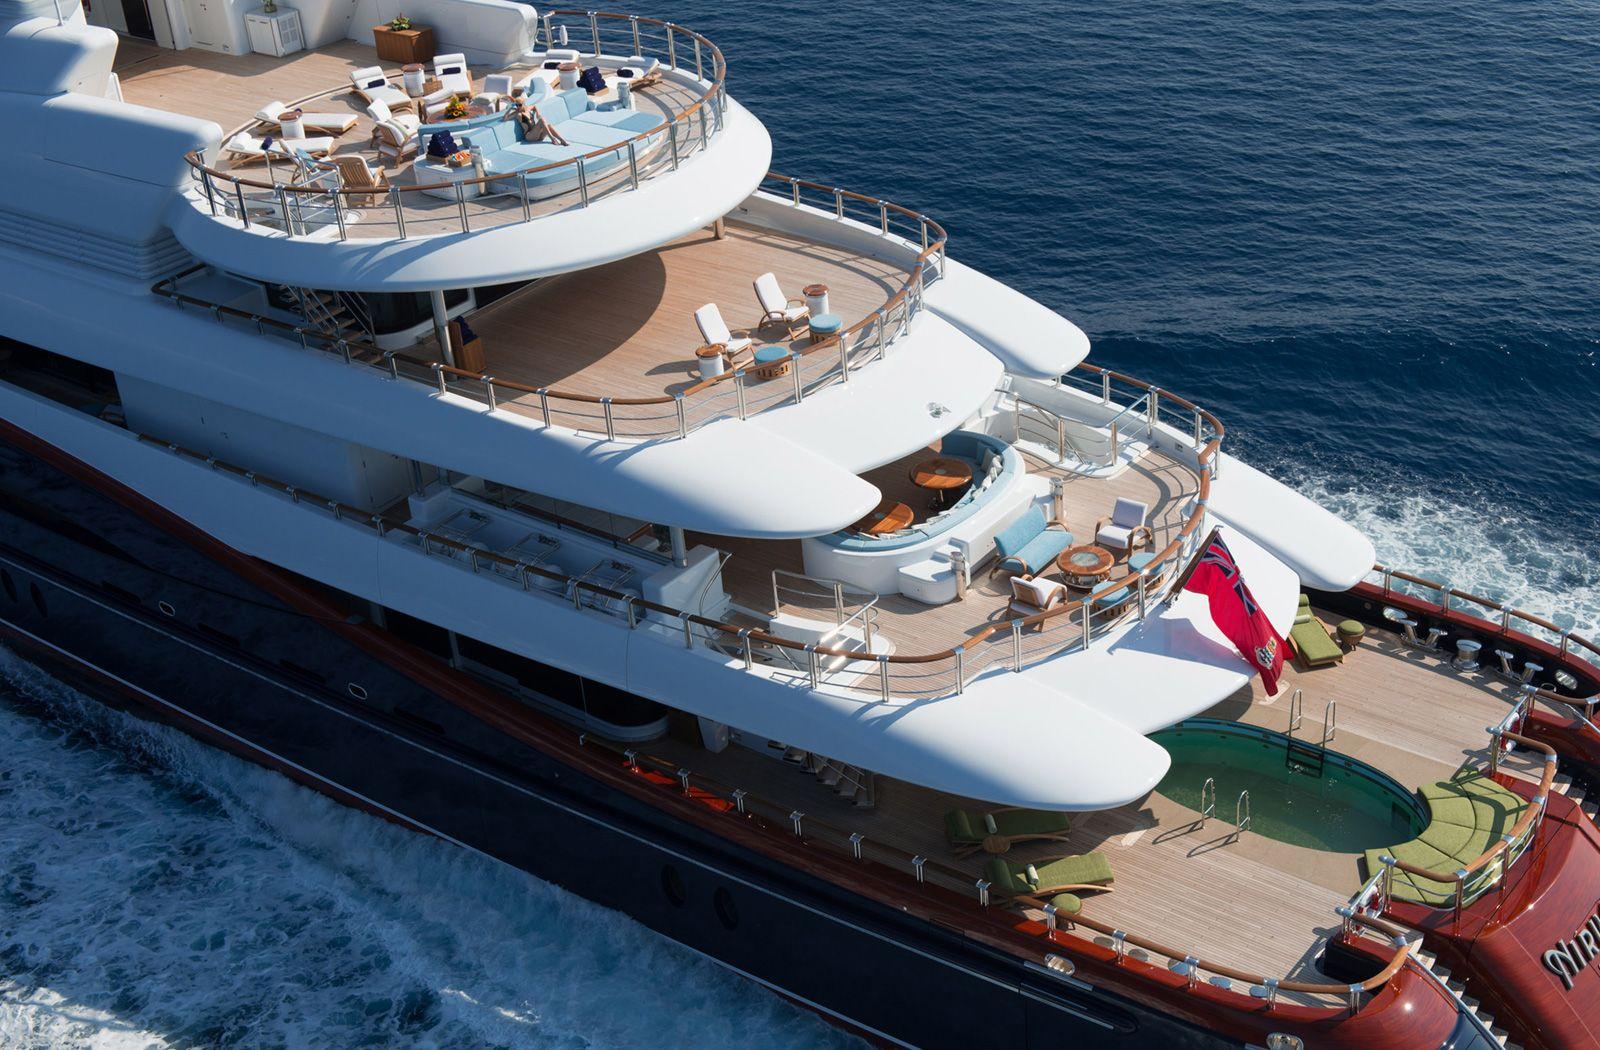 Nirvana yacht charter price oceanco luxury yacht charter - Oceanco Yachts For Visionary Owners Nirvana Y707